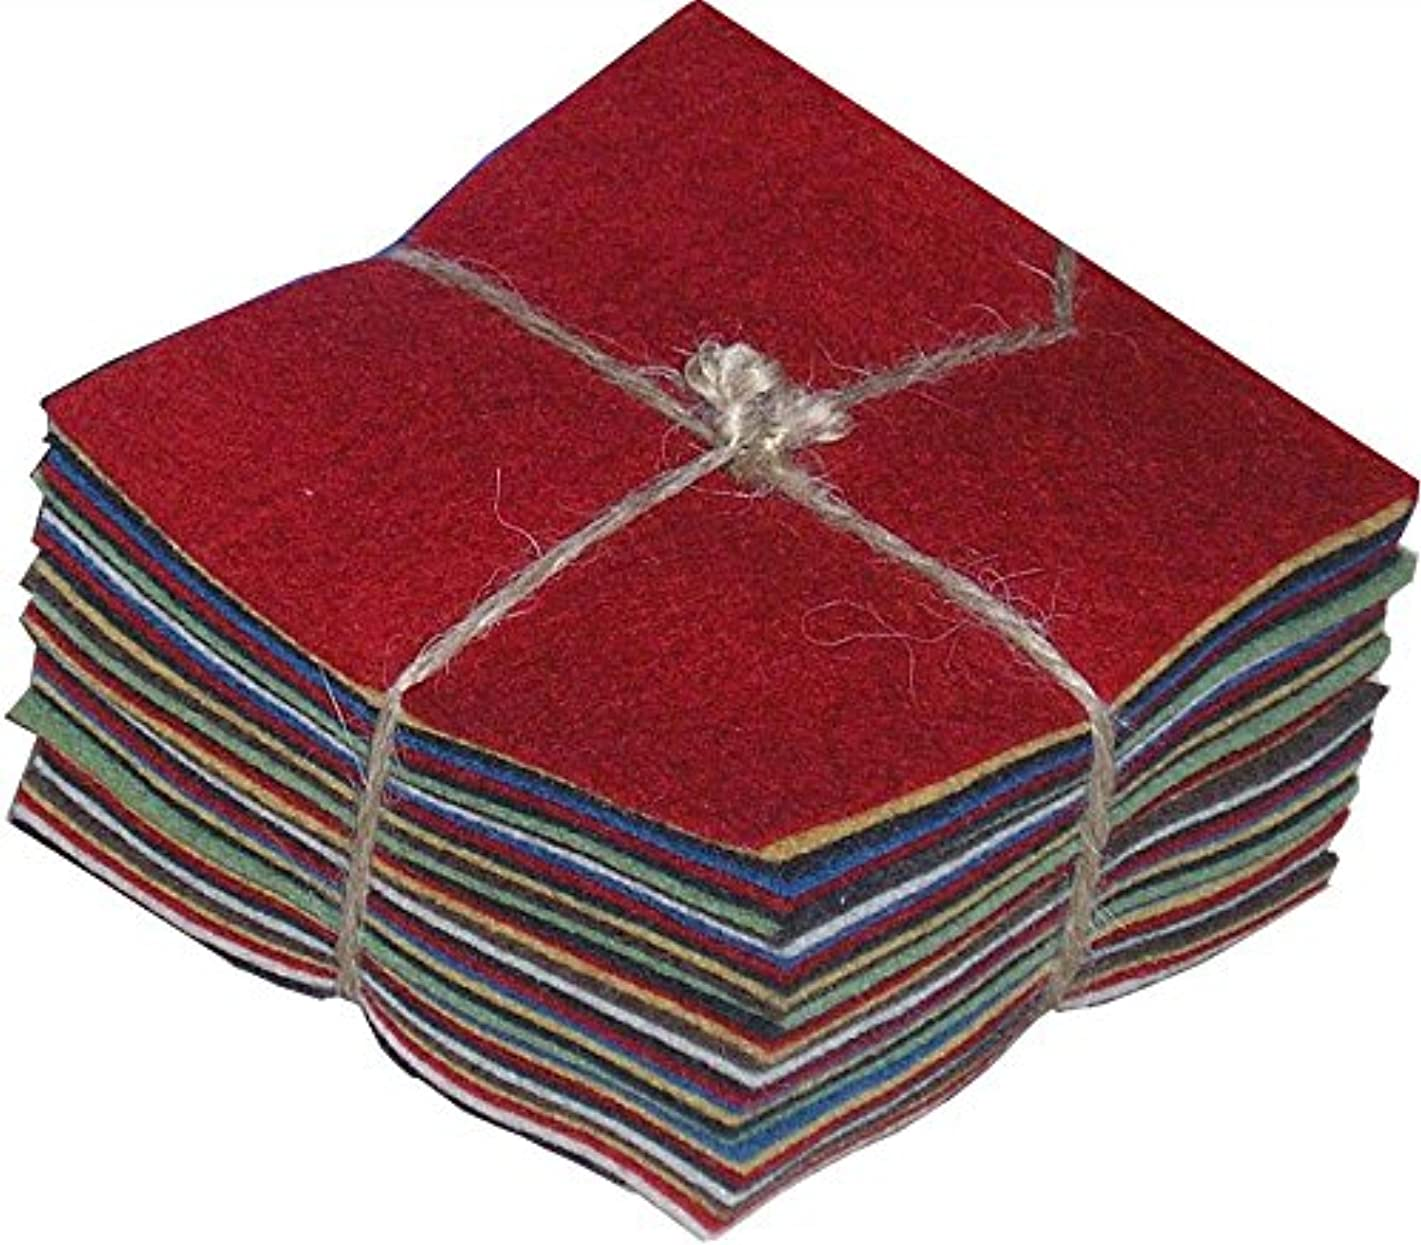 National Nonwovens 100% Wool Felt Homespun Charm Pack